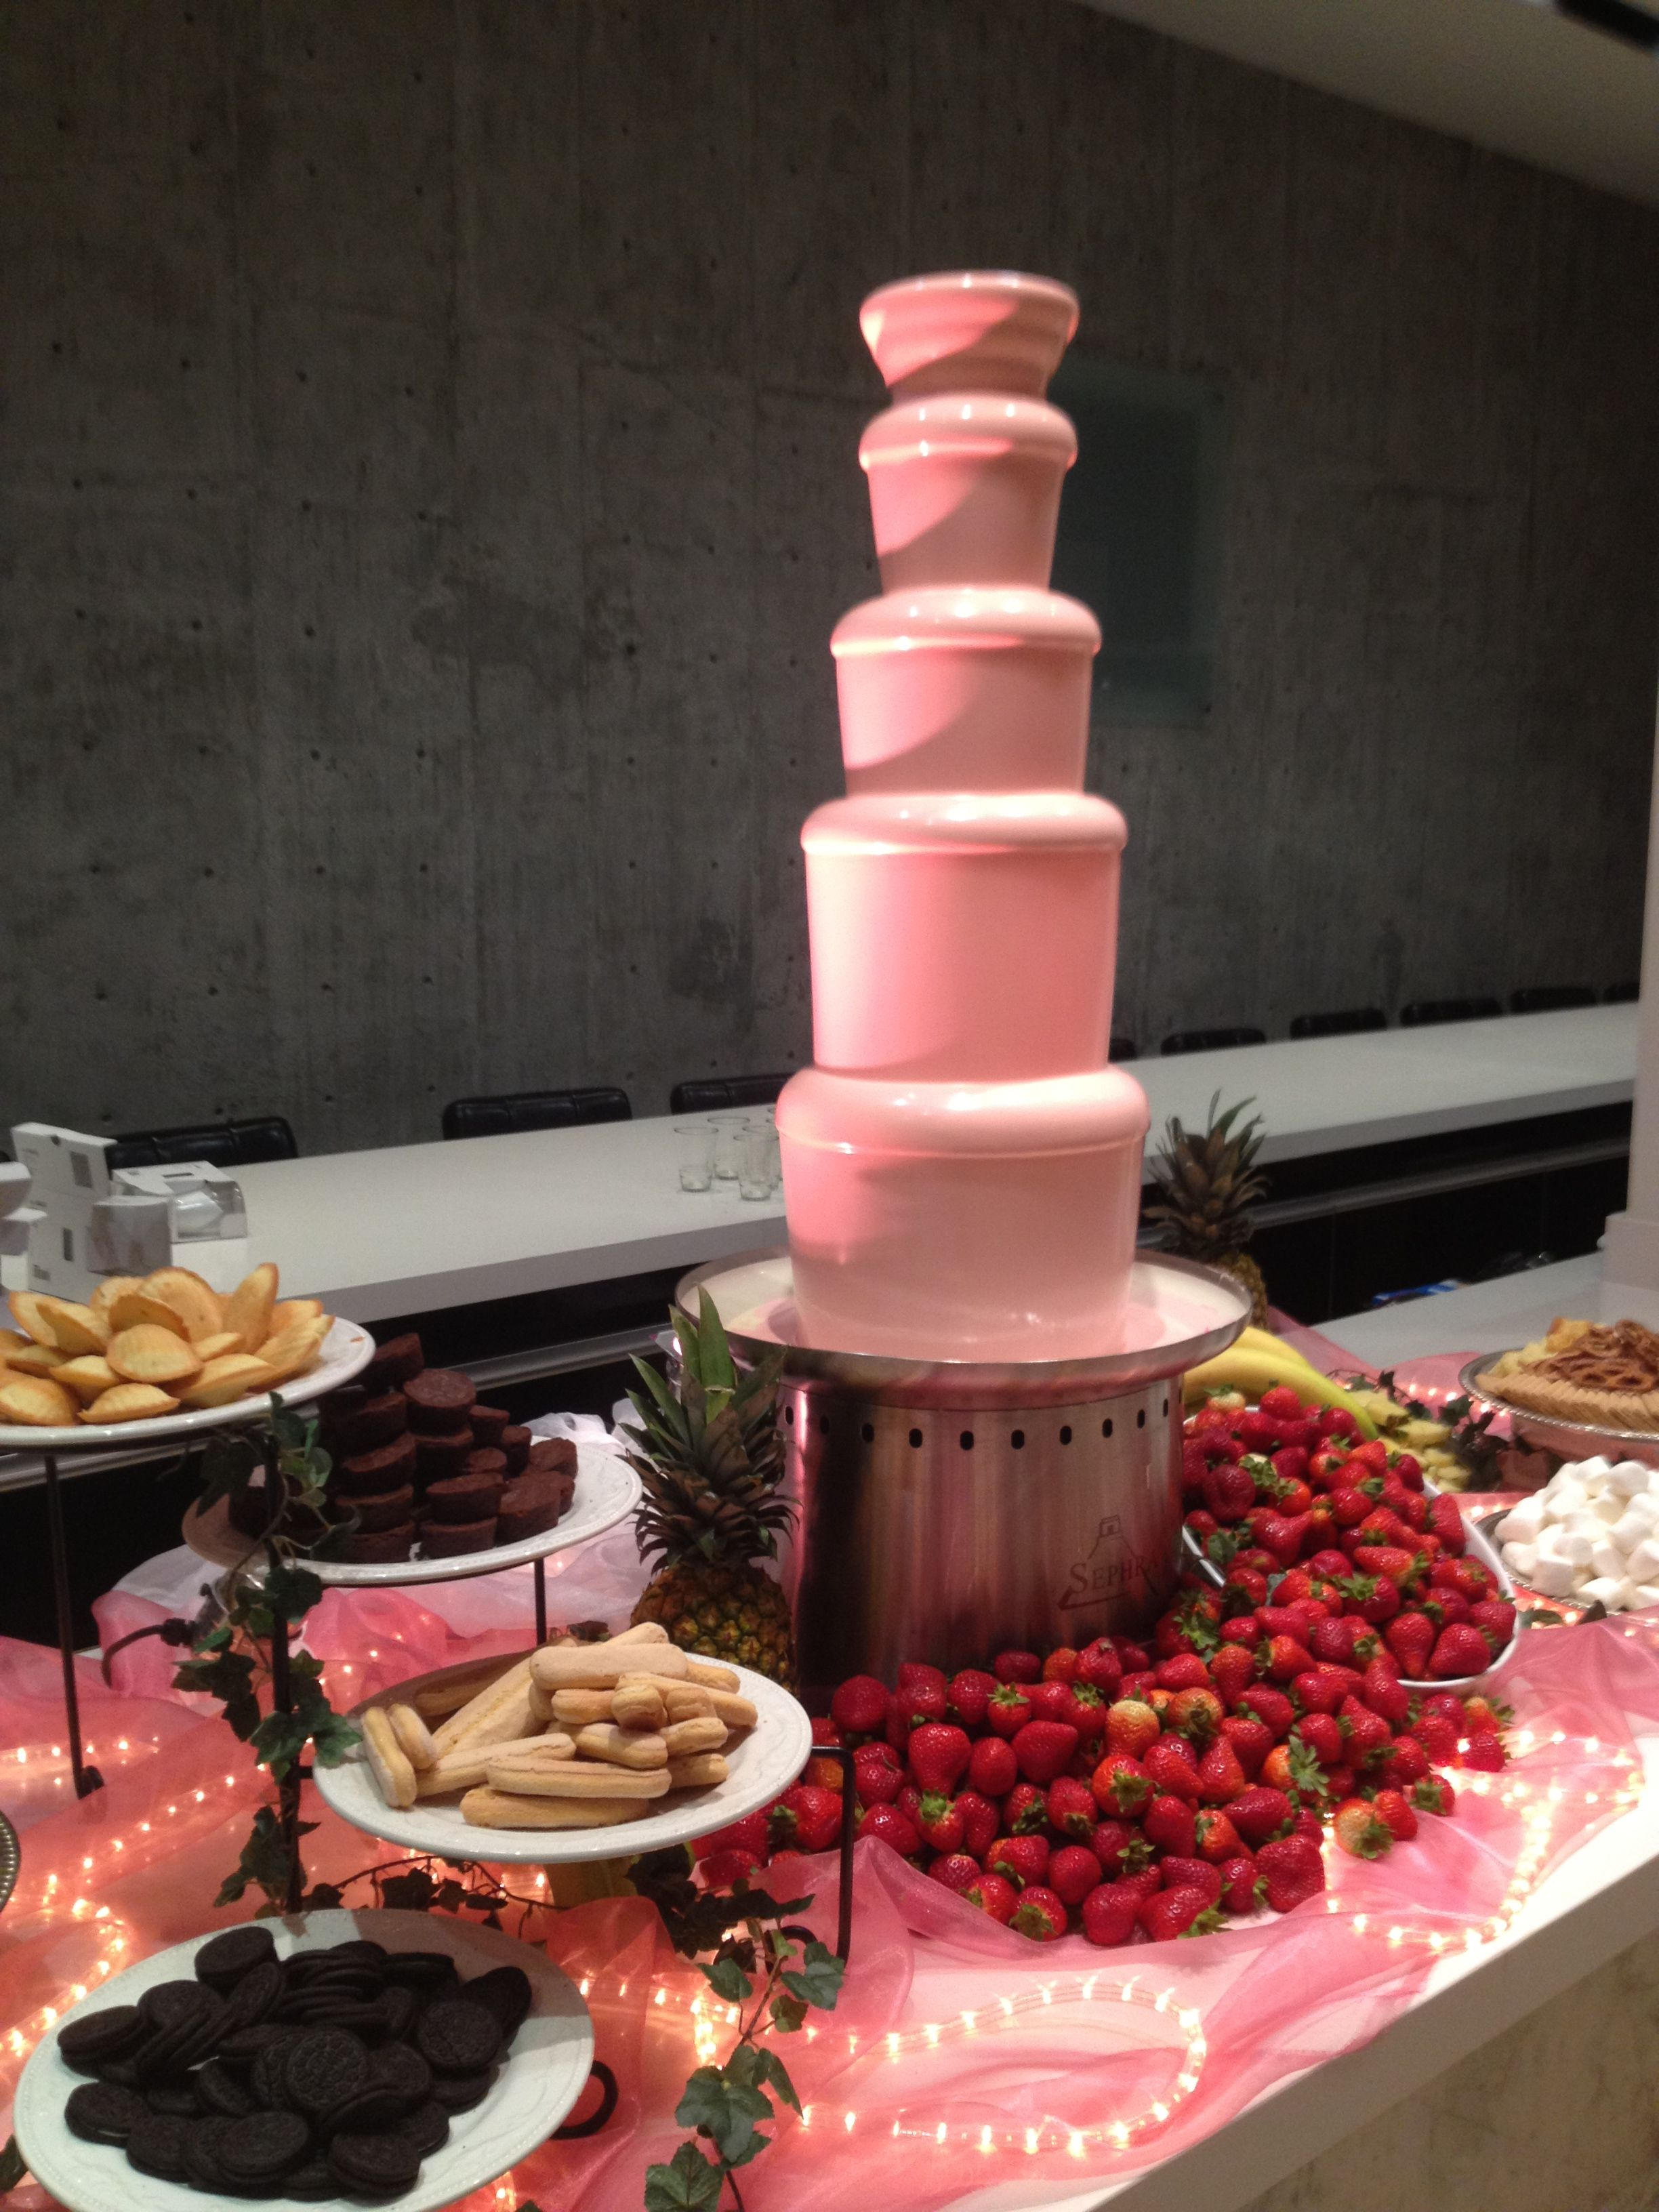 chocolate fountain | Pink Chocolate Fountain - Amor Chocolate ...